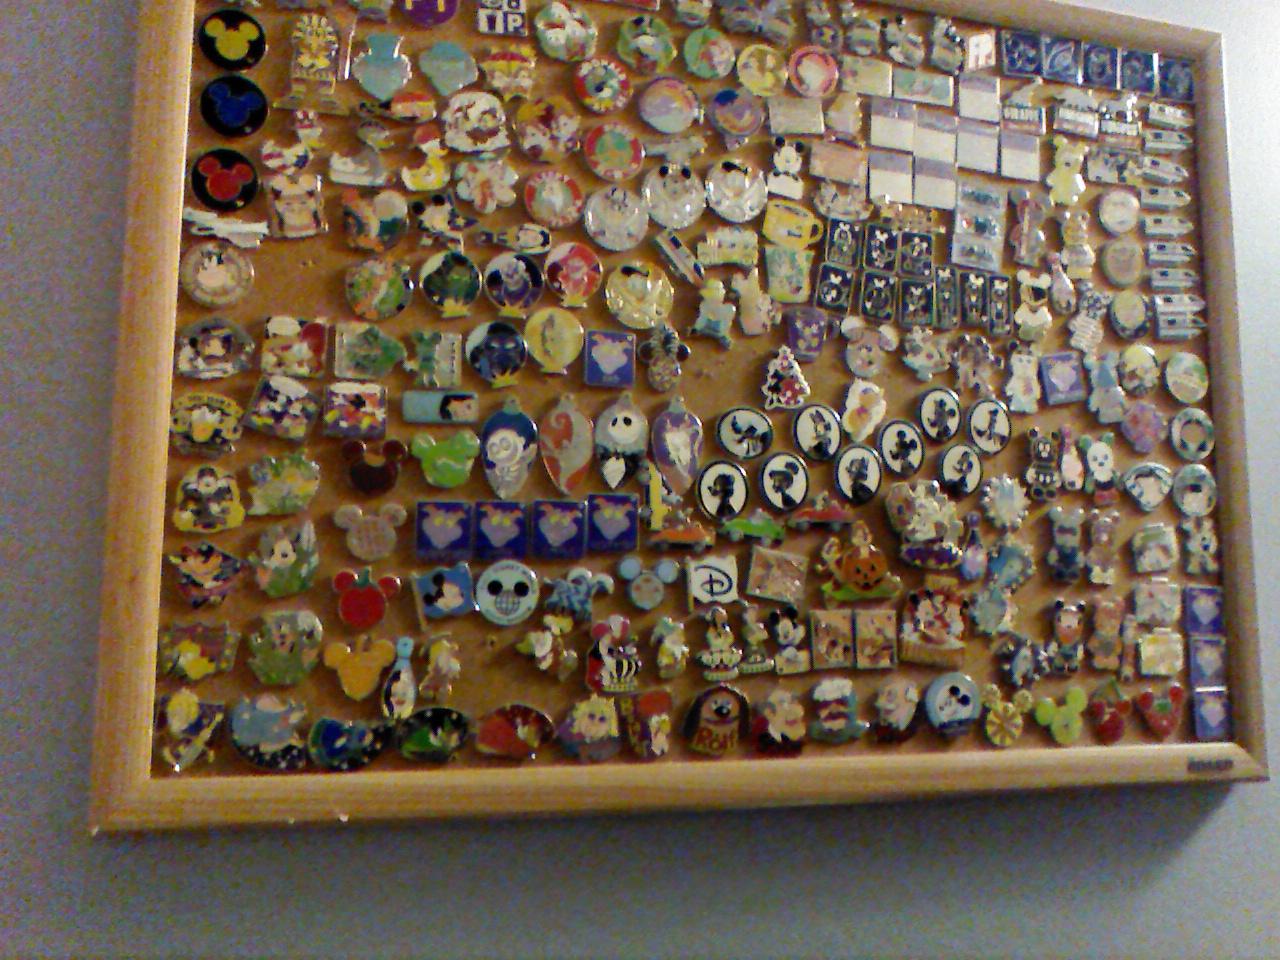 The Disney Pin Collector